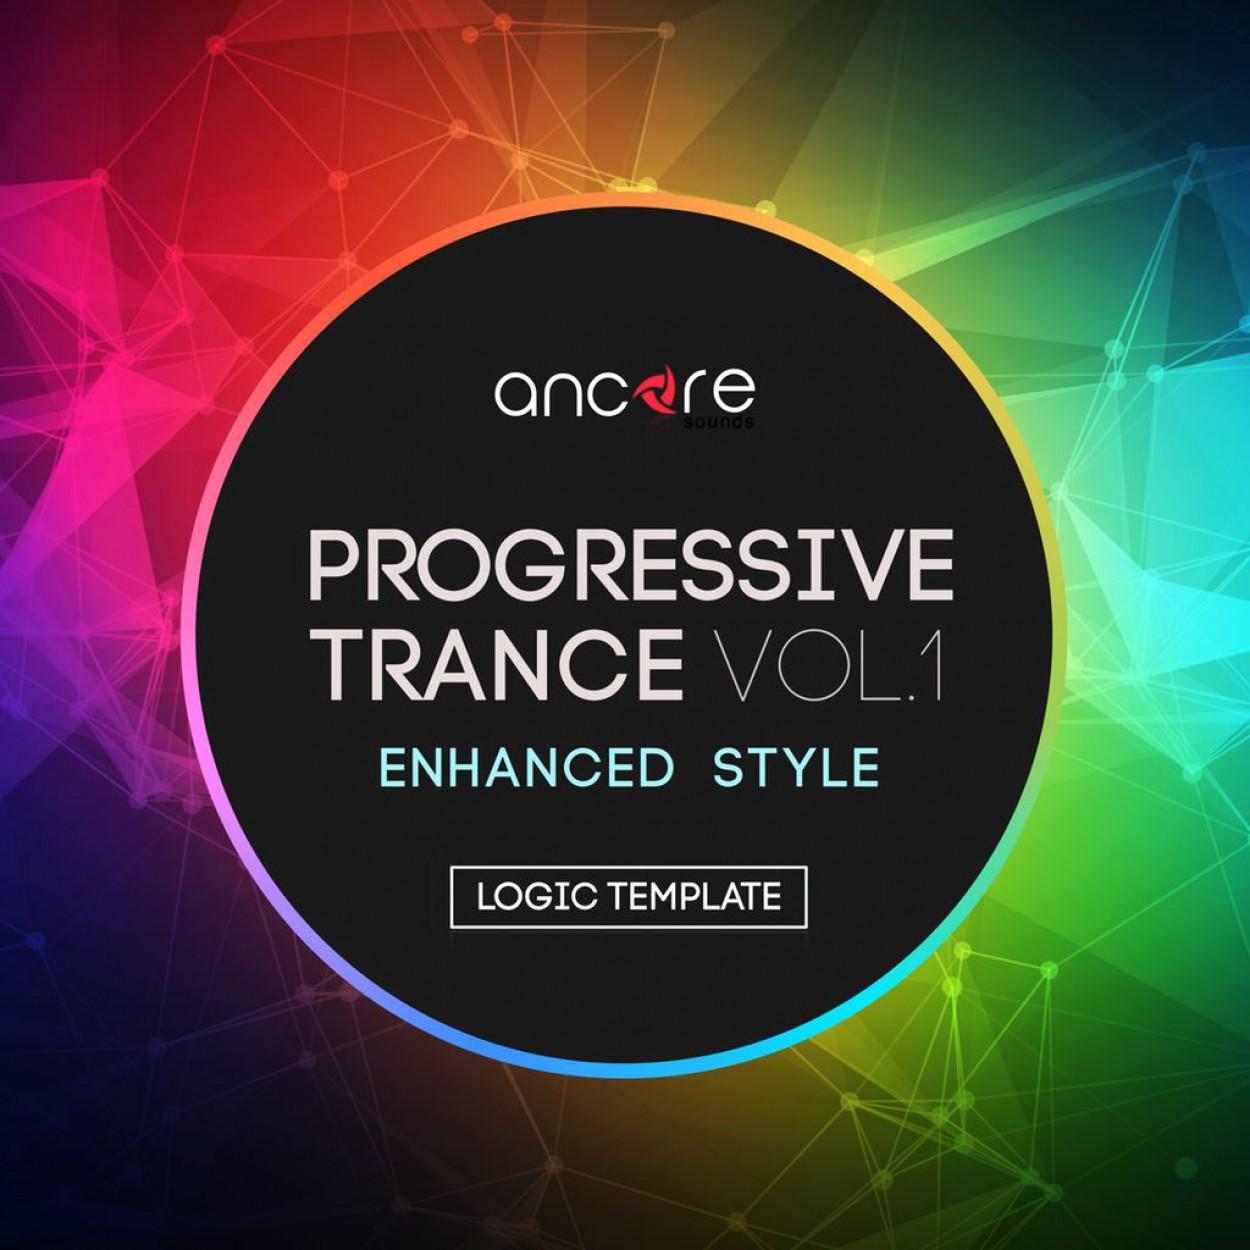 Progressive Trance 2.0 Logic Pro Template (Enhanced Style) Vol.1